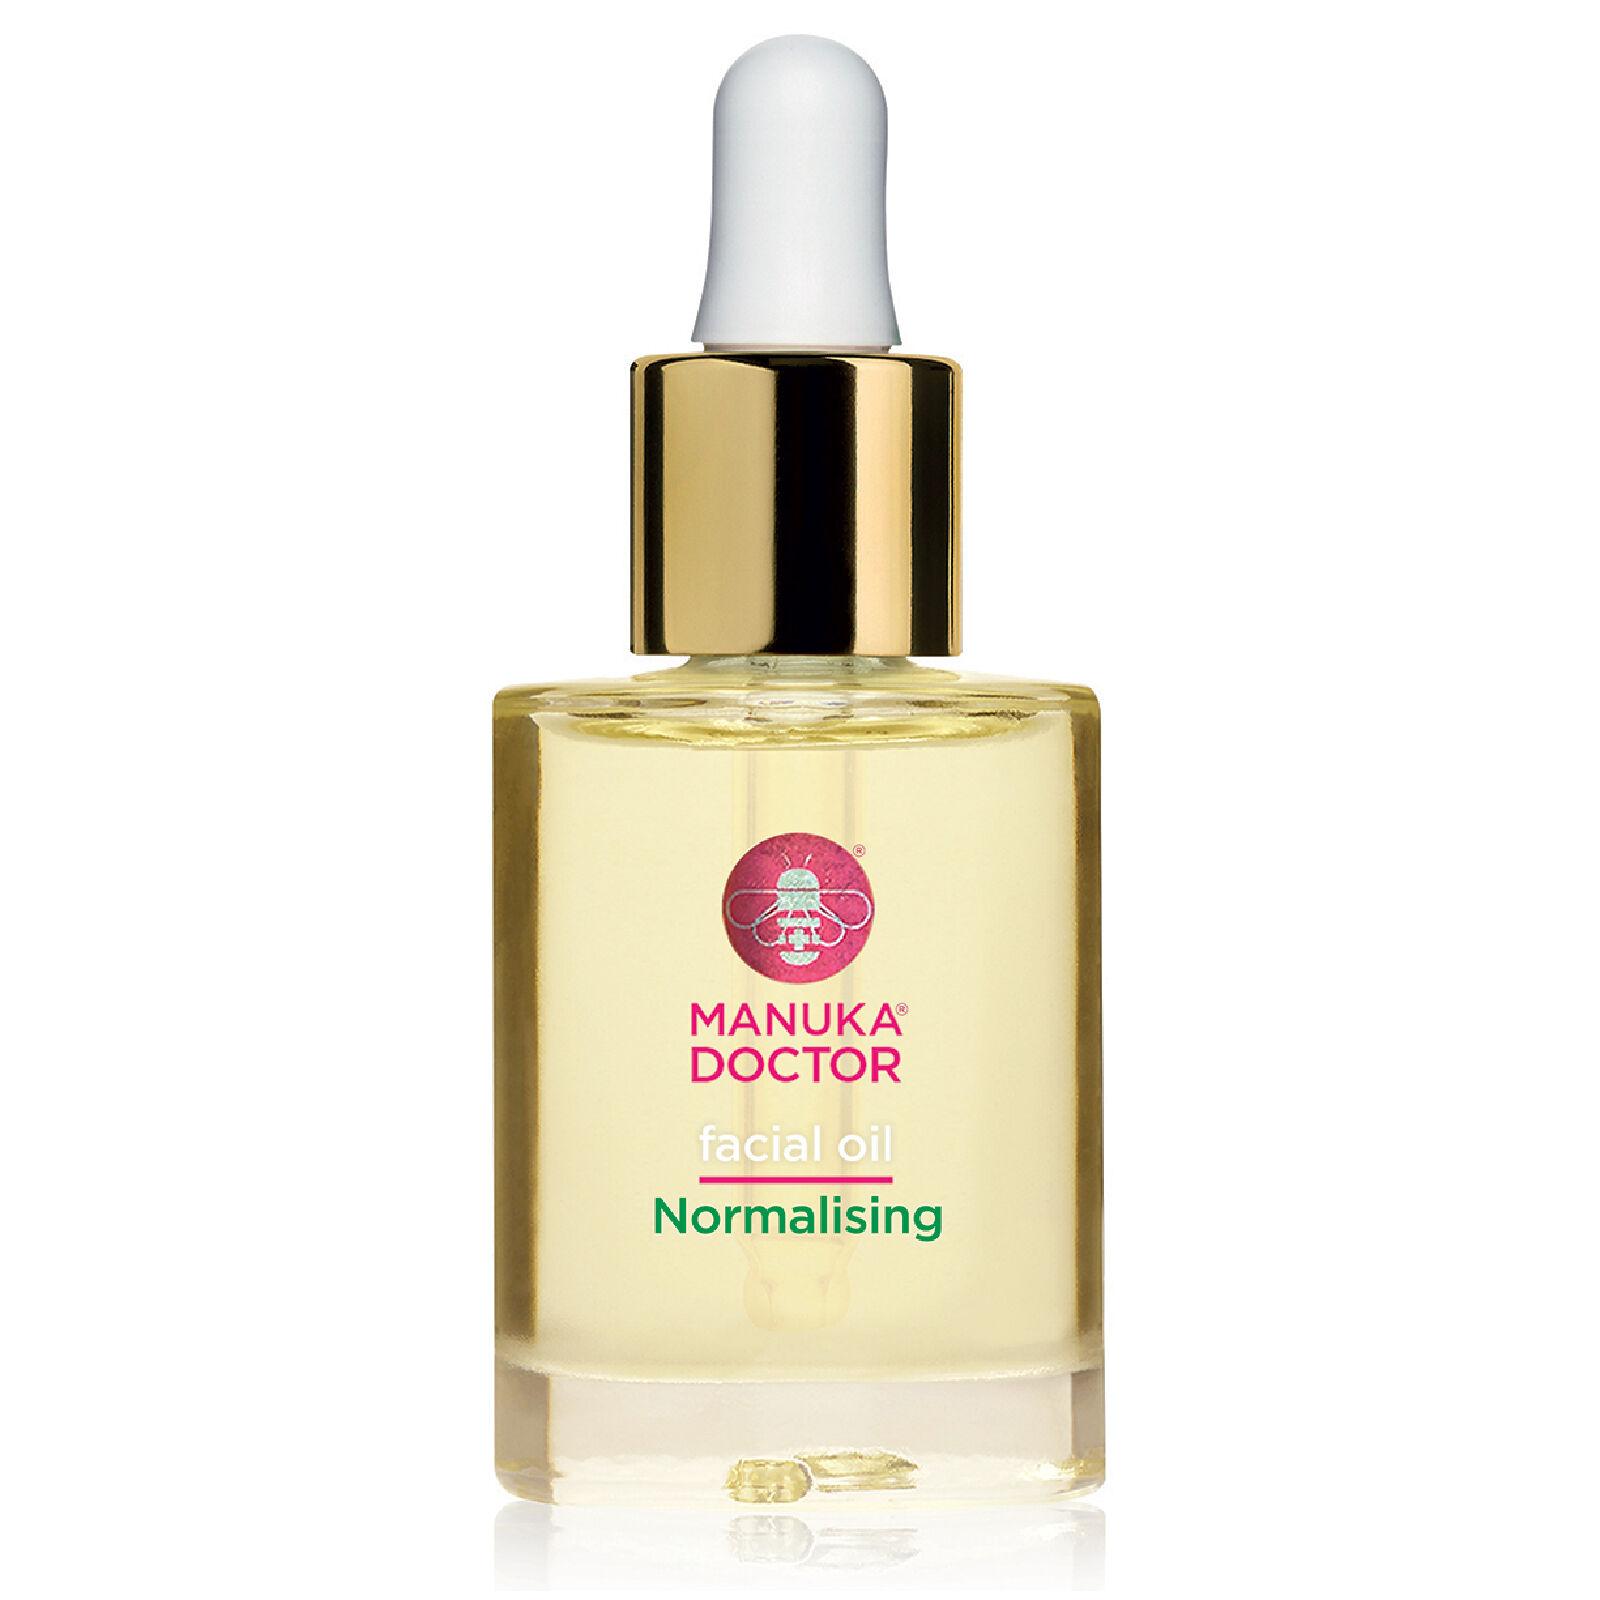 Manuka Doctor Huile Visage Équilibrante Normalising Facial Oil Manuka Doctor 25 ml